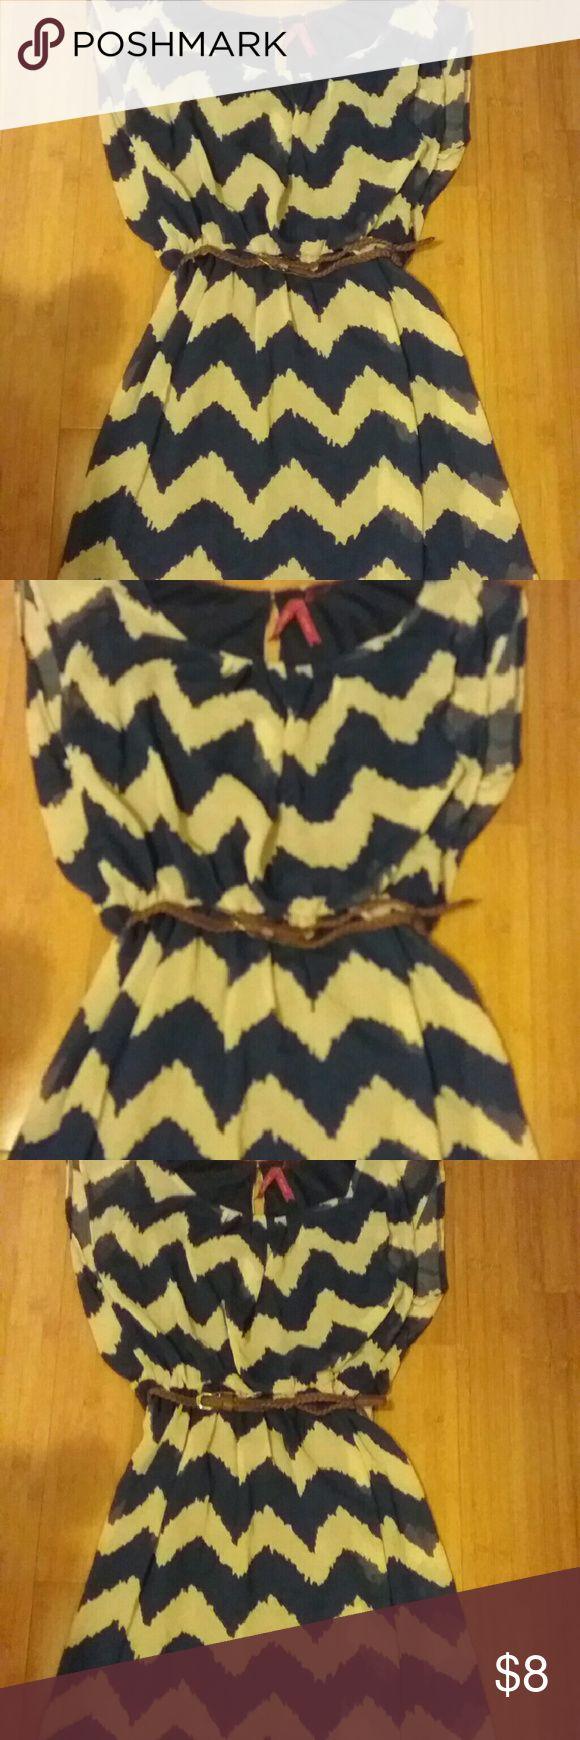 Blouson dress with chevron print Navy blue and cream colored chevron print, elastic waist with woven belt, nwt. Dresses Mini